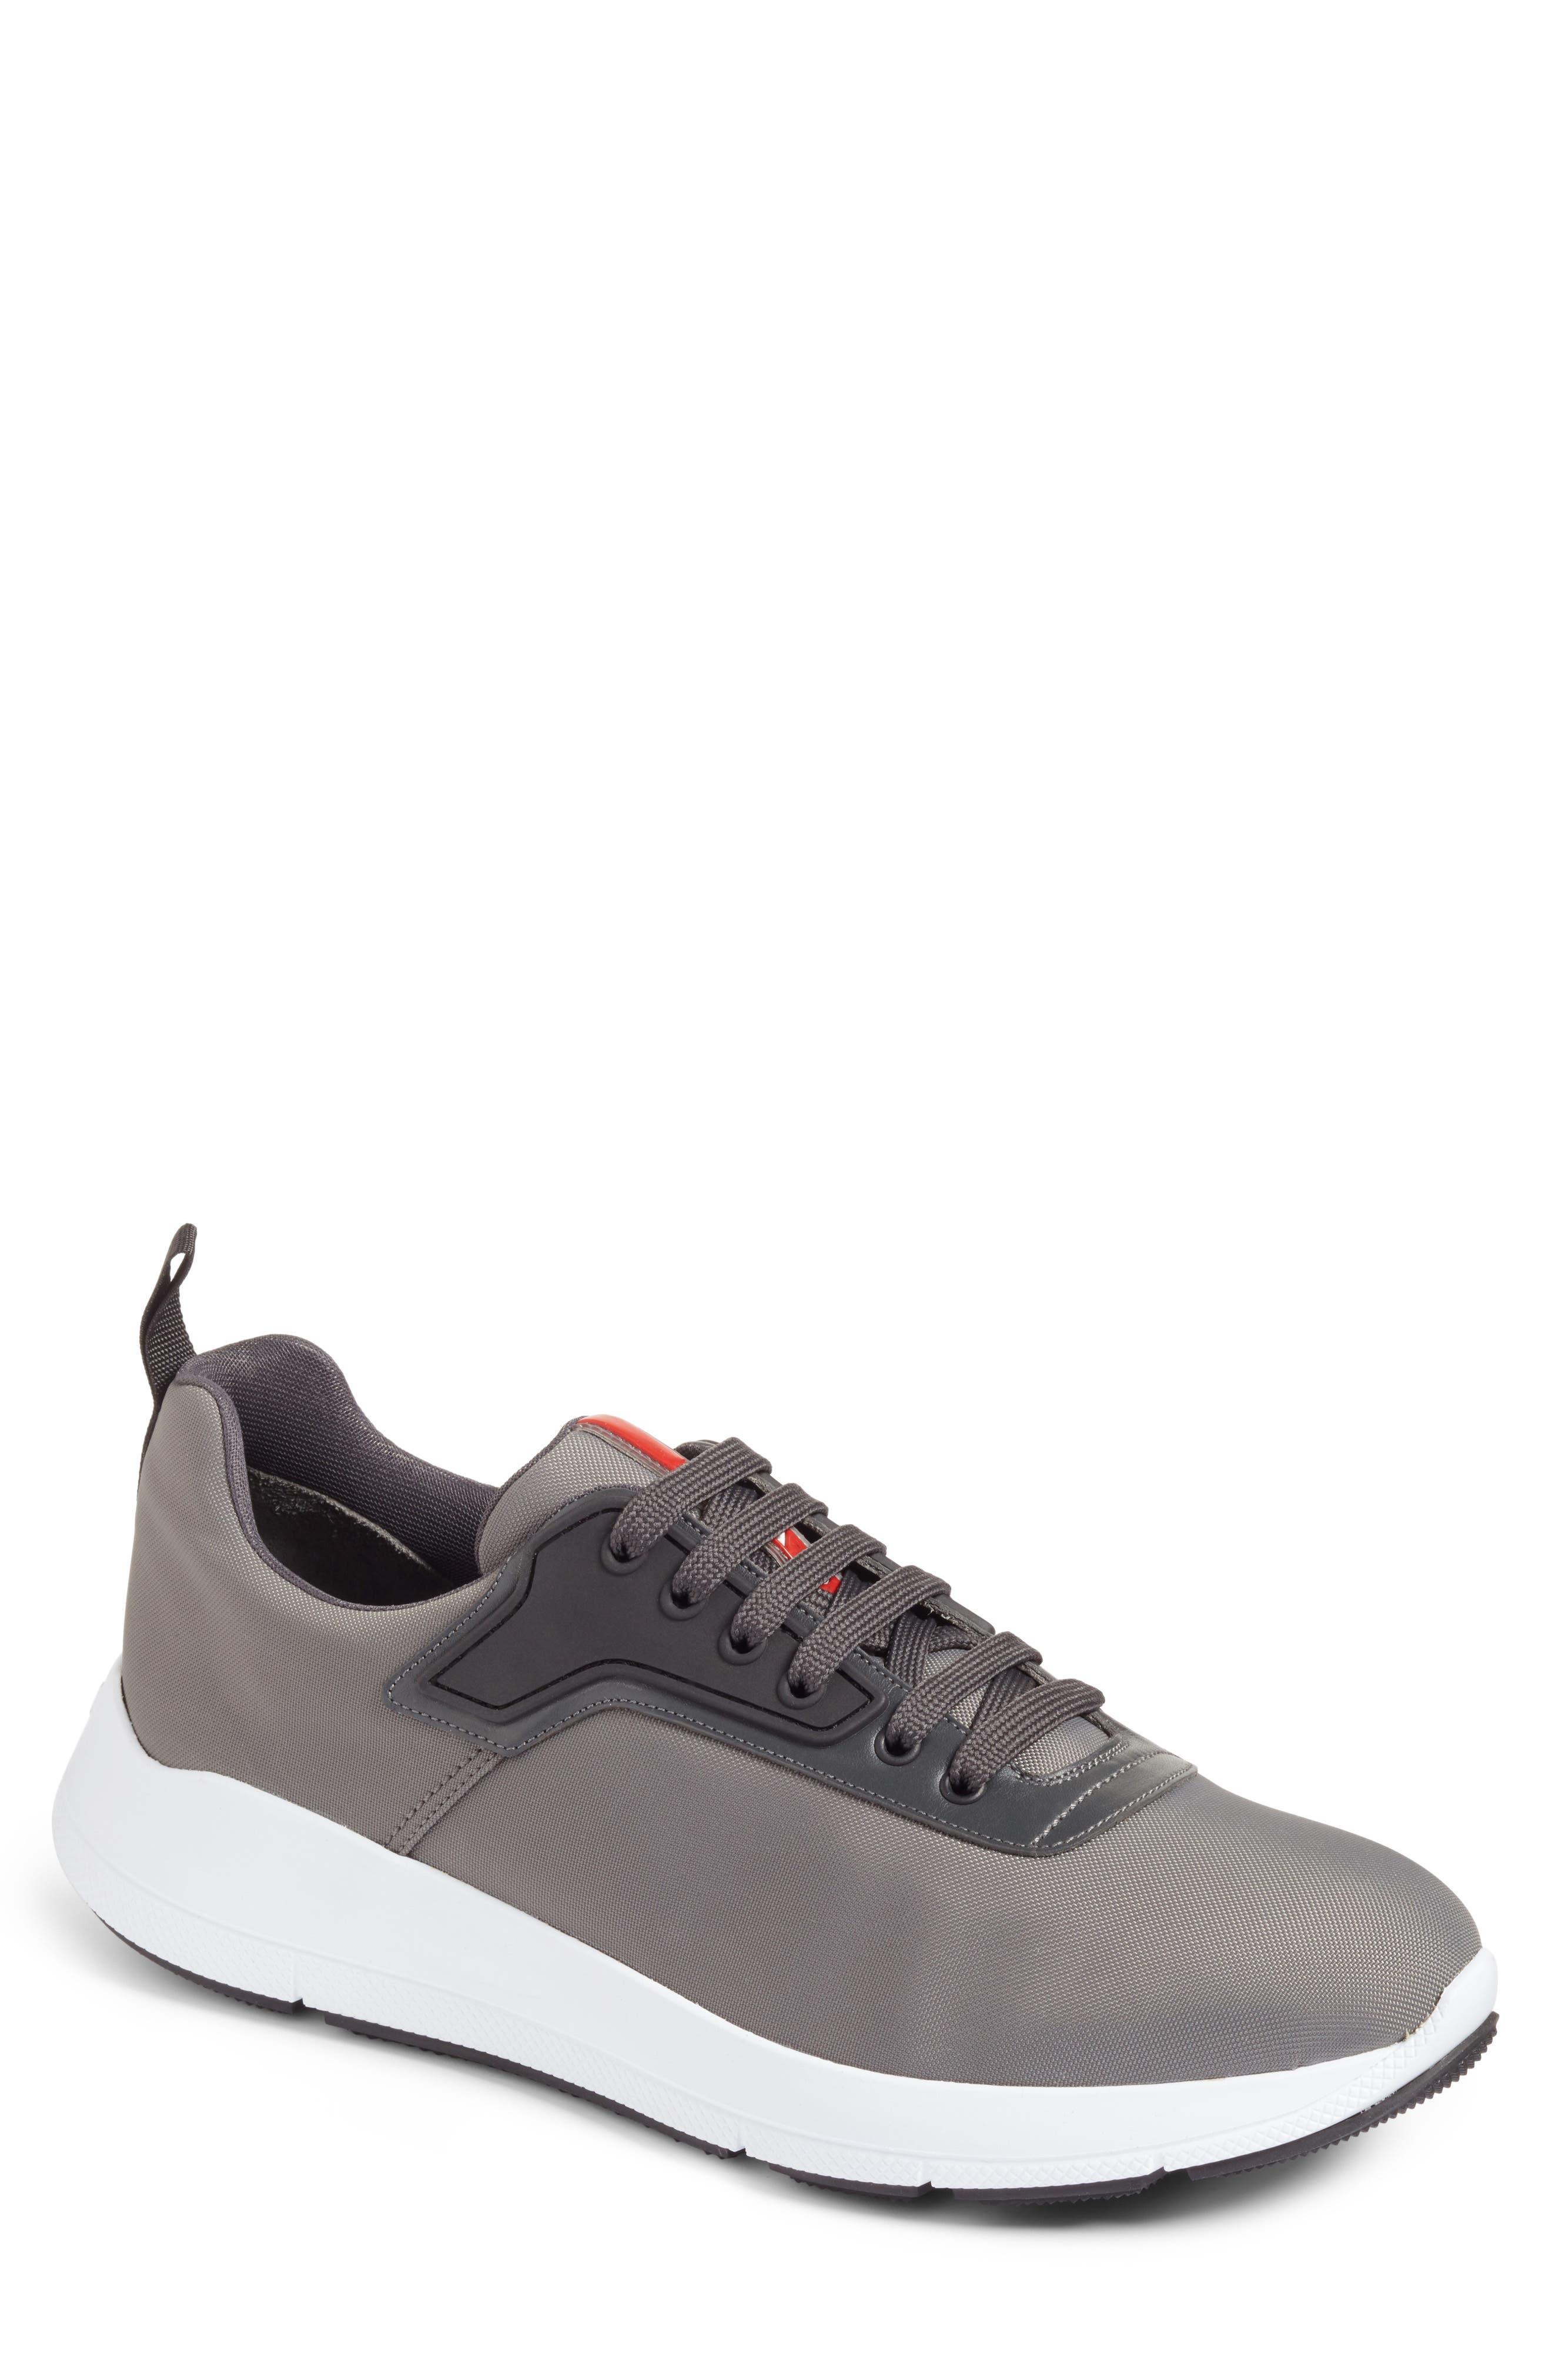 Linea Rossa Tech Sneaker,                             Main thumbnail 1, color,                             253